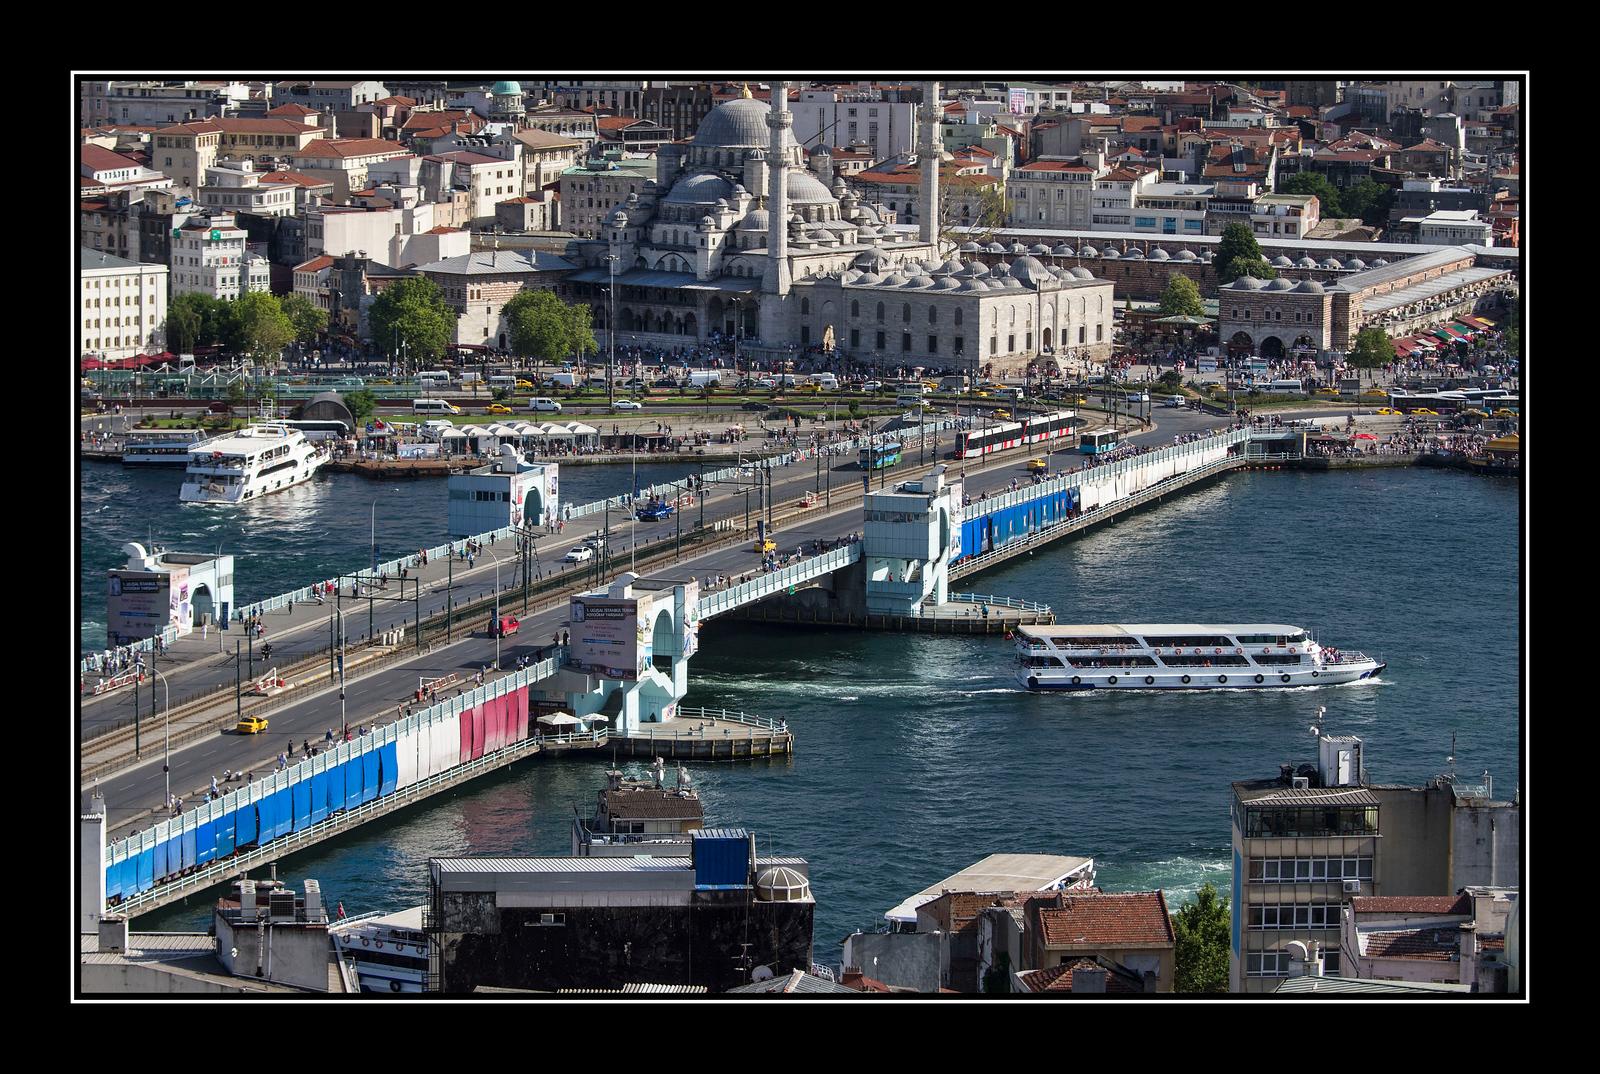 IMAGE: https://photos.smugmug.com/Travel/Istanbul/i-rp3pmRG/0/68019e51/X3/Golden%20Horn%20Galata%20Bridge%20from%20Galata%20Towewr-X3.jpg